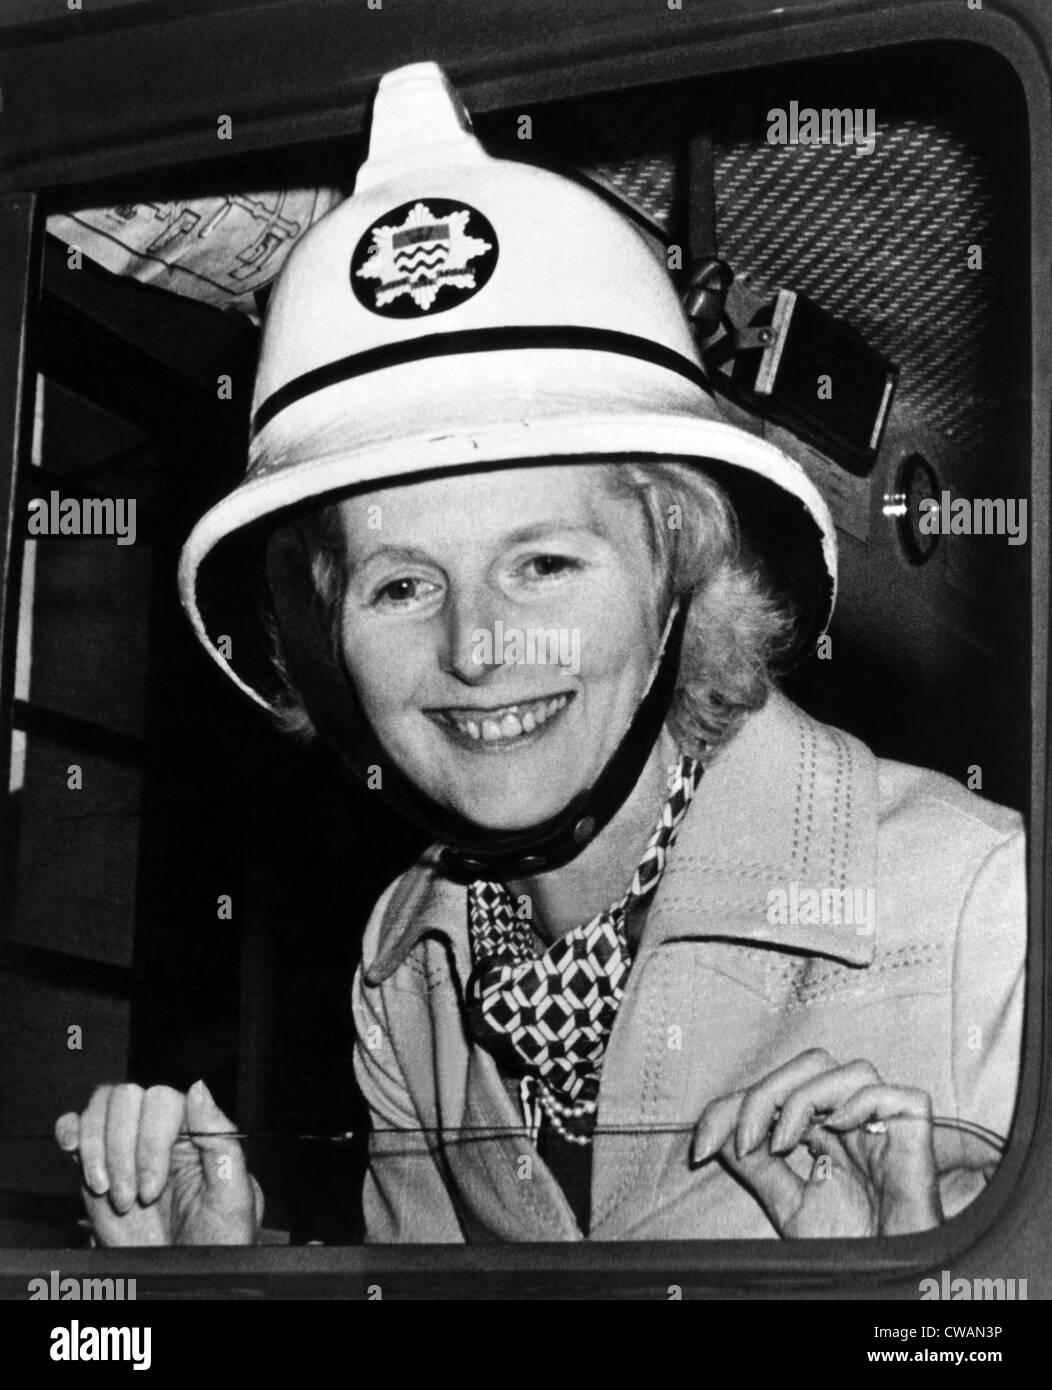 Margaret Thatcher, el futuro Primer Ministro del Reino Unido, circa 1976. Cortesía: CSU Archives/Everett Collection Imagen De Stock